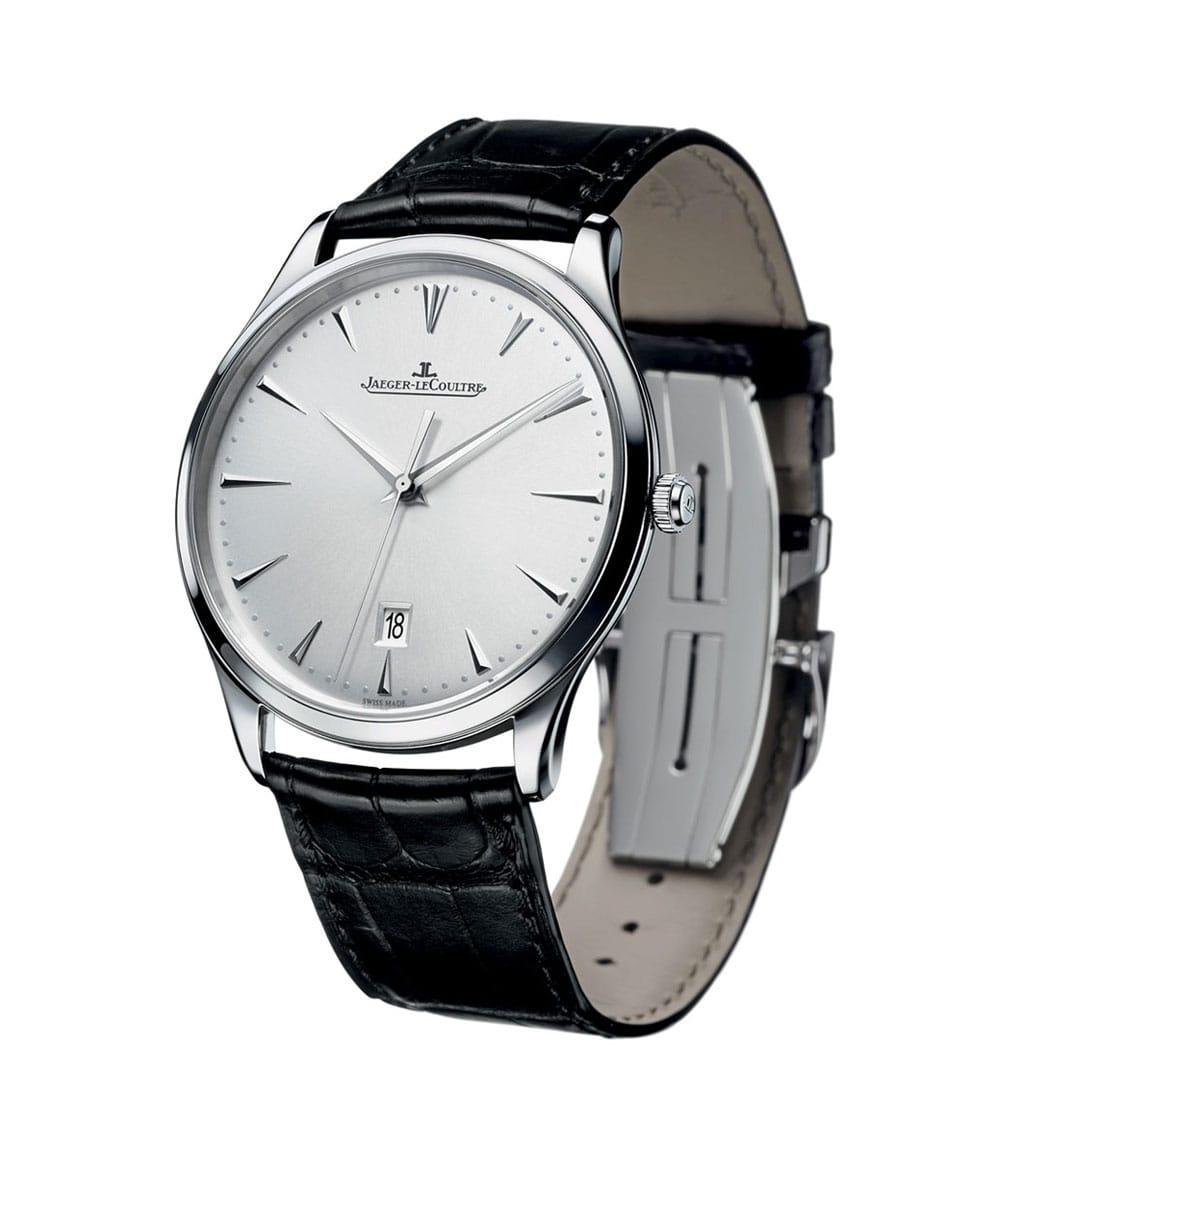 Highlight-Jaeger-Lecoultre-Master-Ultra-Thin-Date Lionel Meylan Horlogerie Joaillerie Vevey